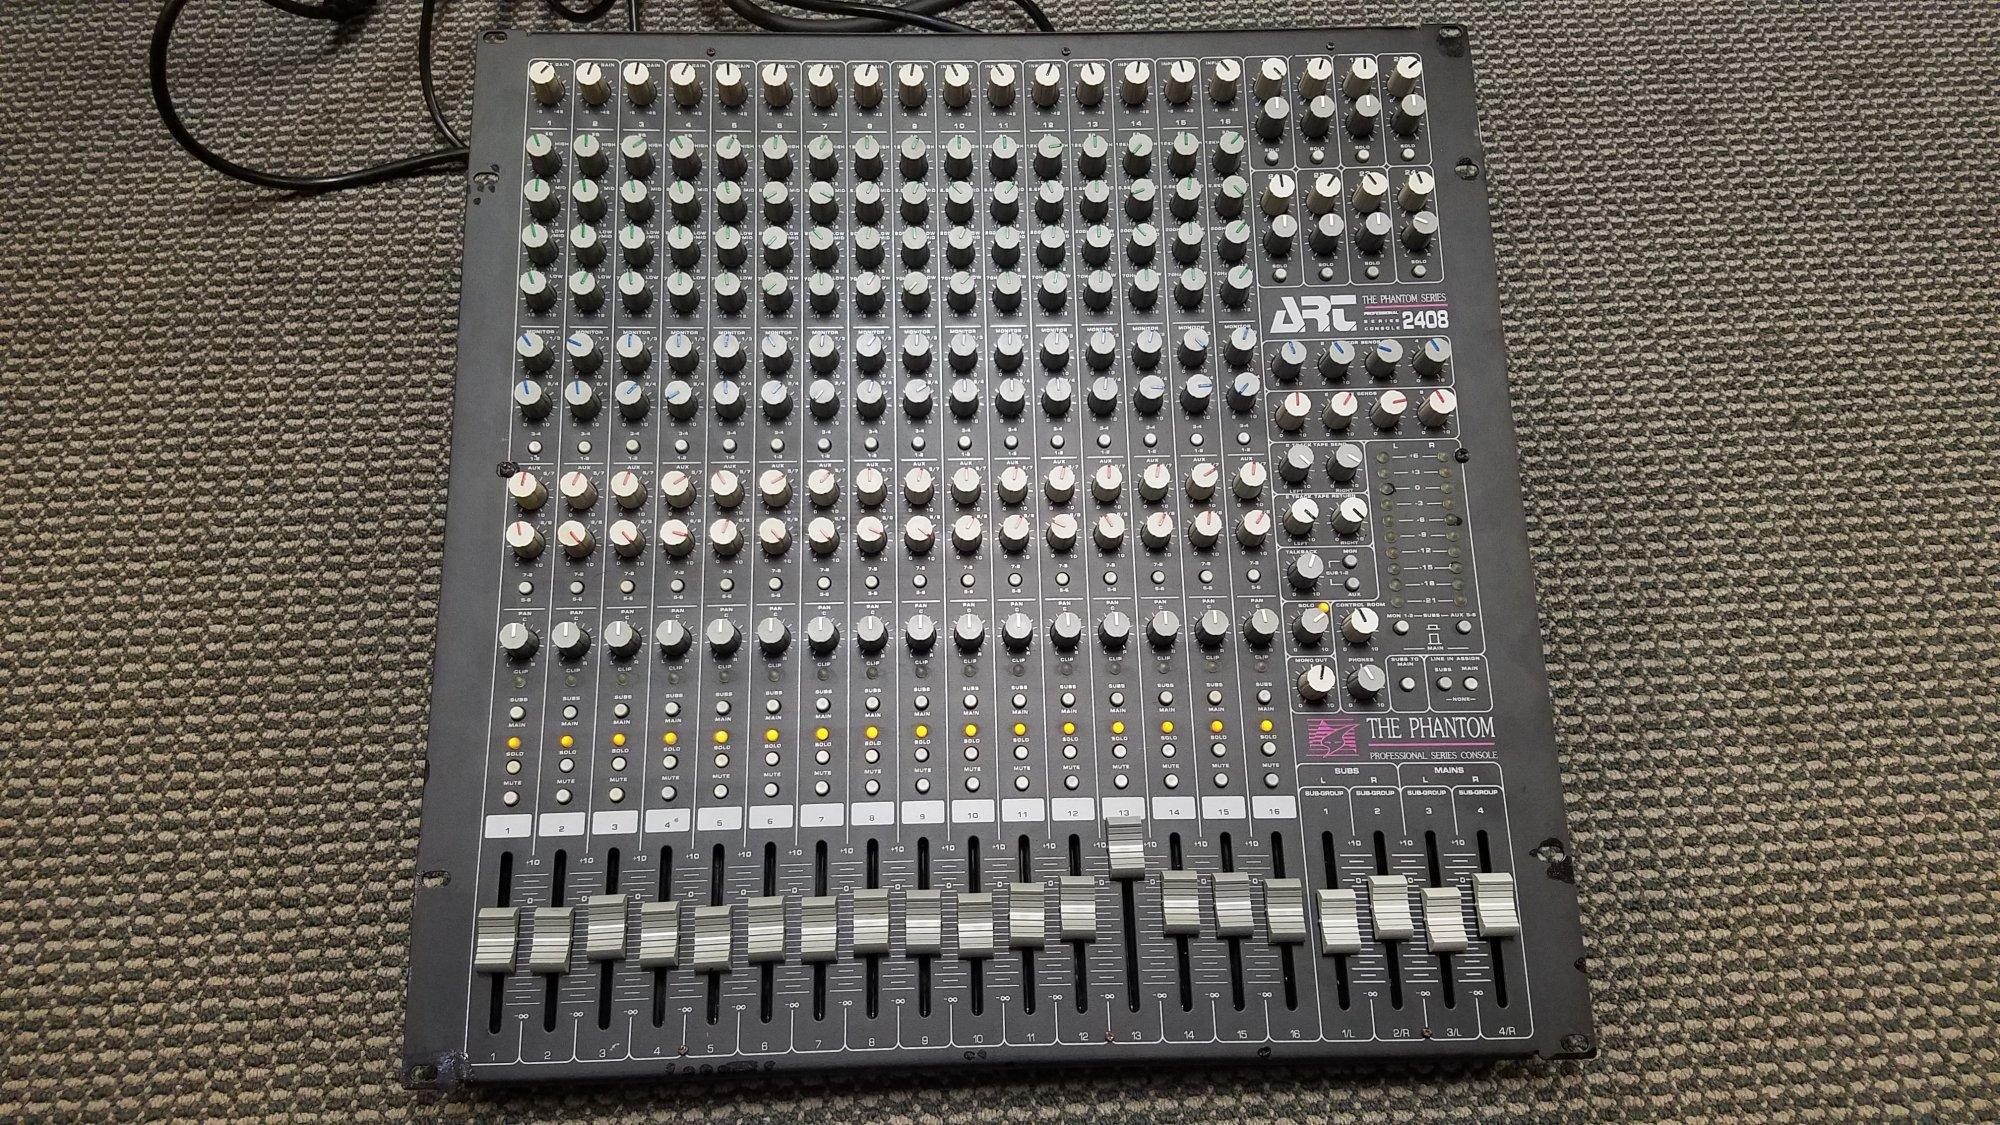 ART Phantom Series 2408 Mixing Console